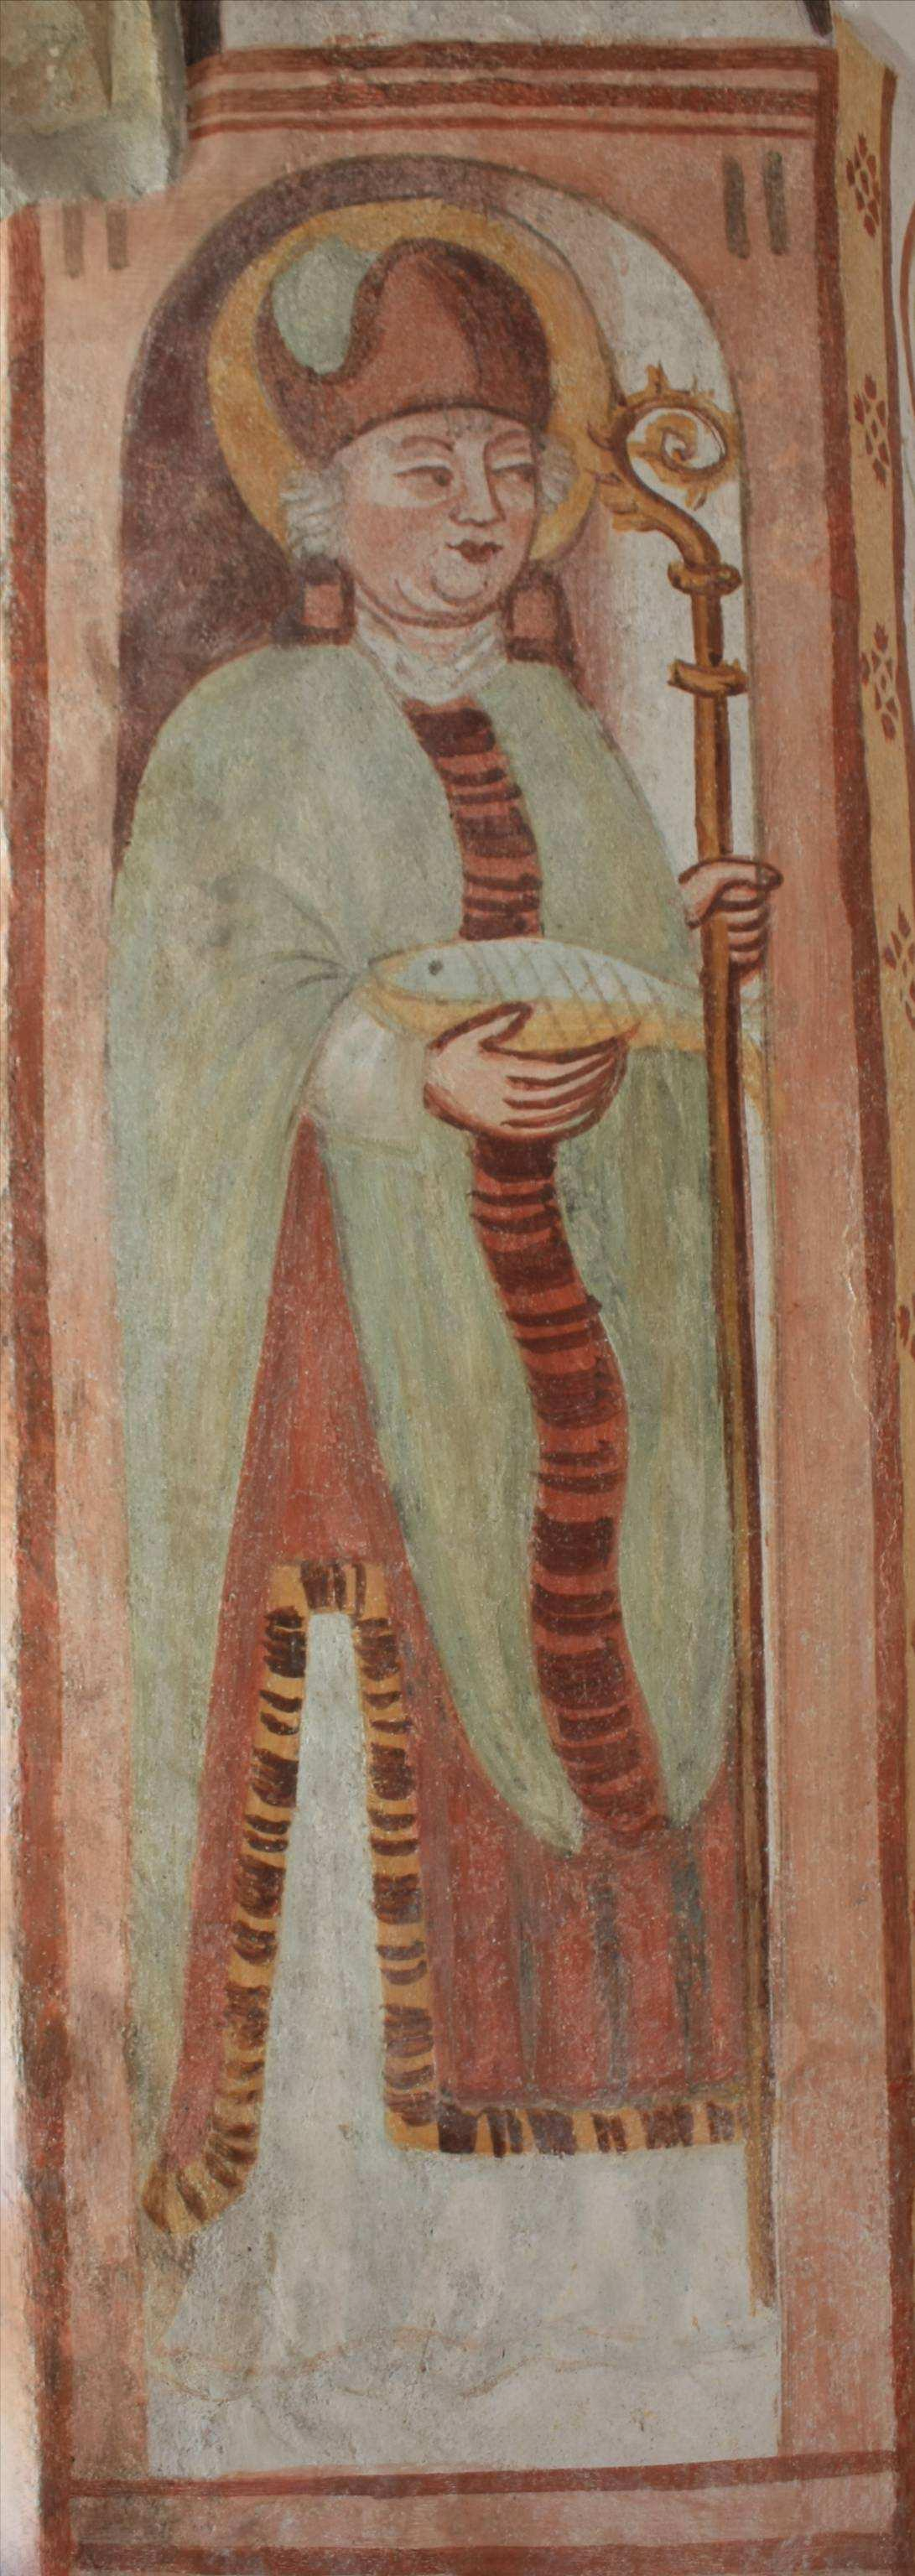 Bartholomäus von Lack, Der hl. Benno, um 1530, St. Nikolauskirche Godešič, Slowenien